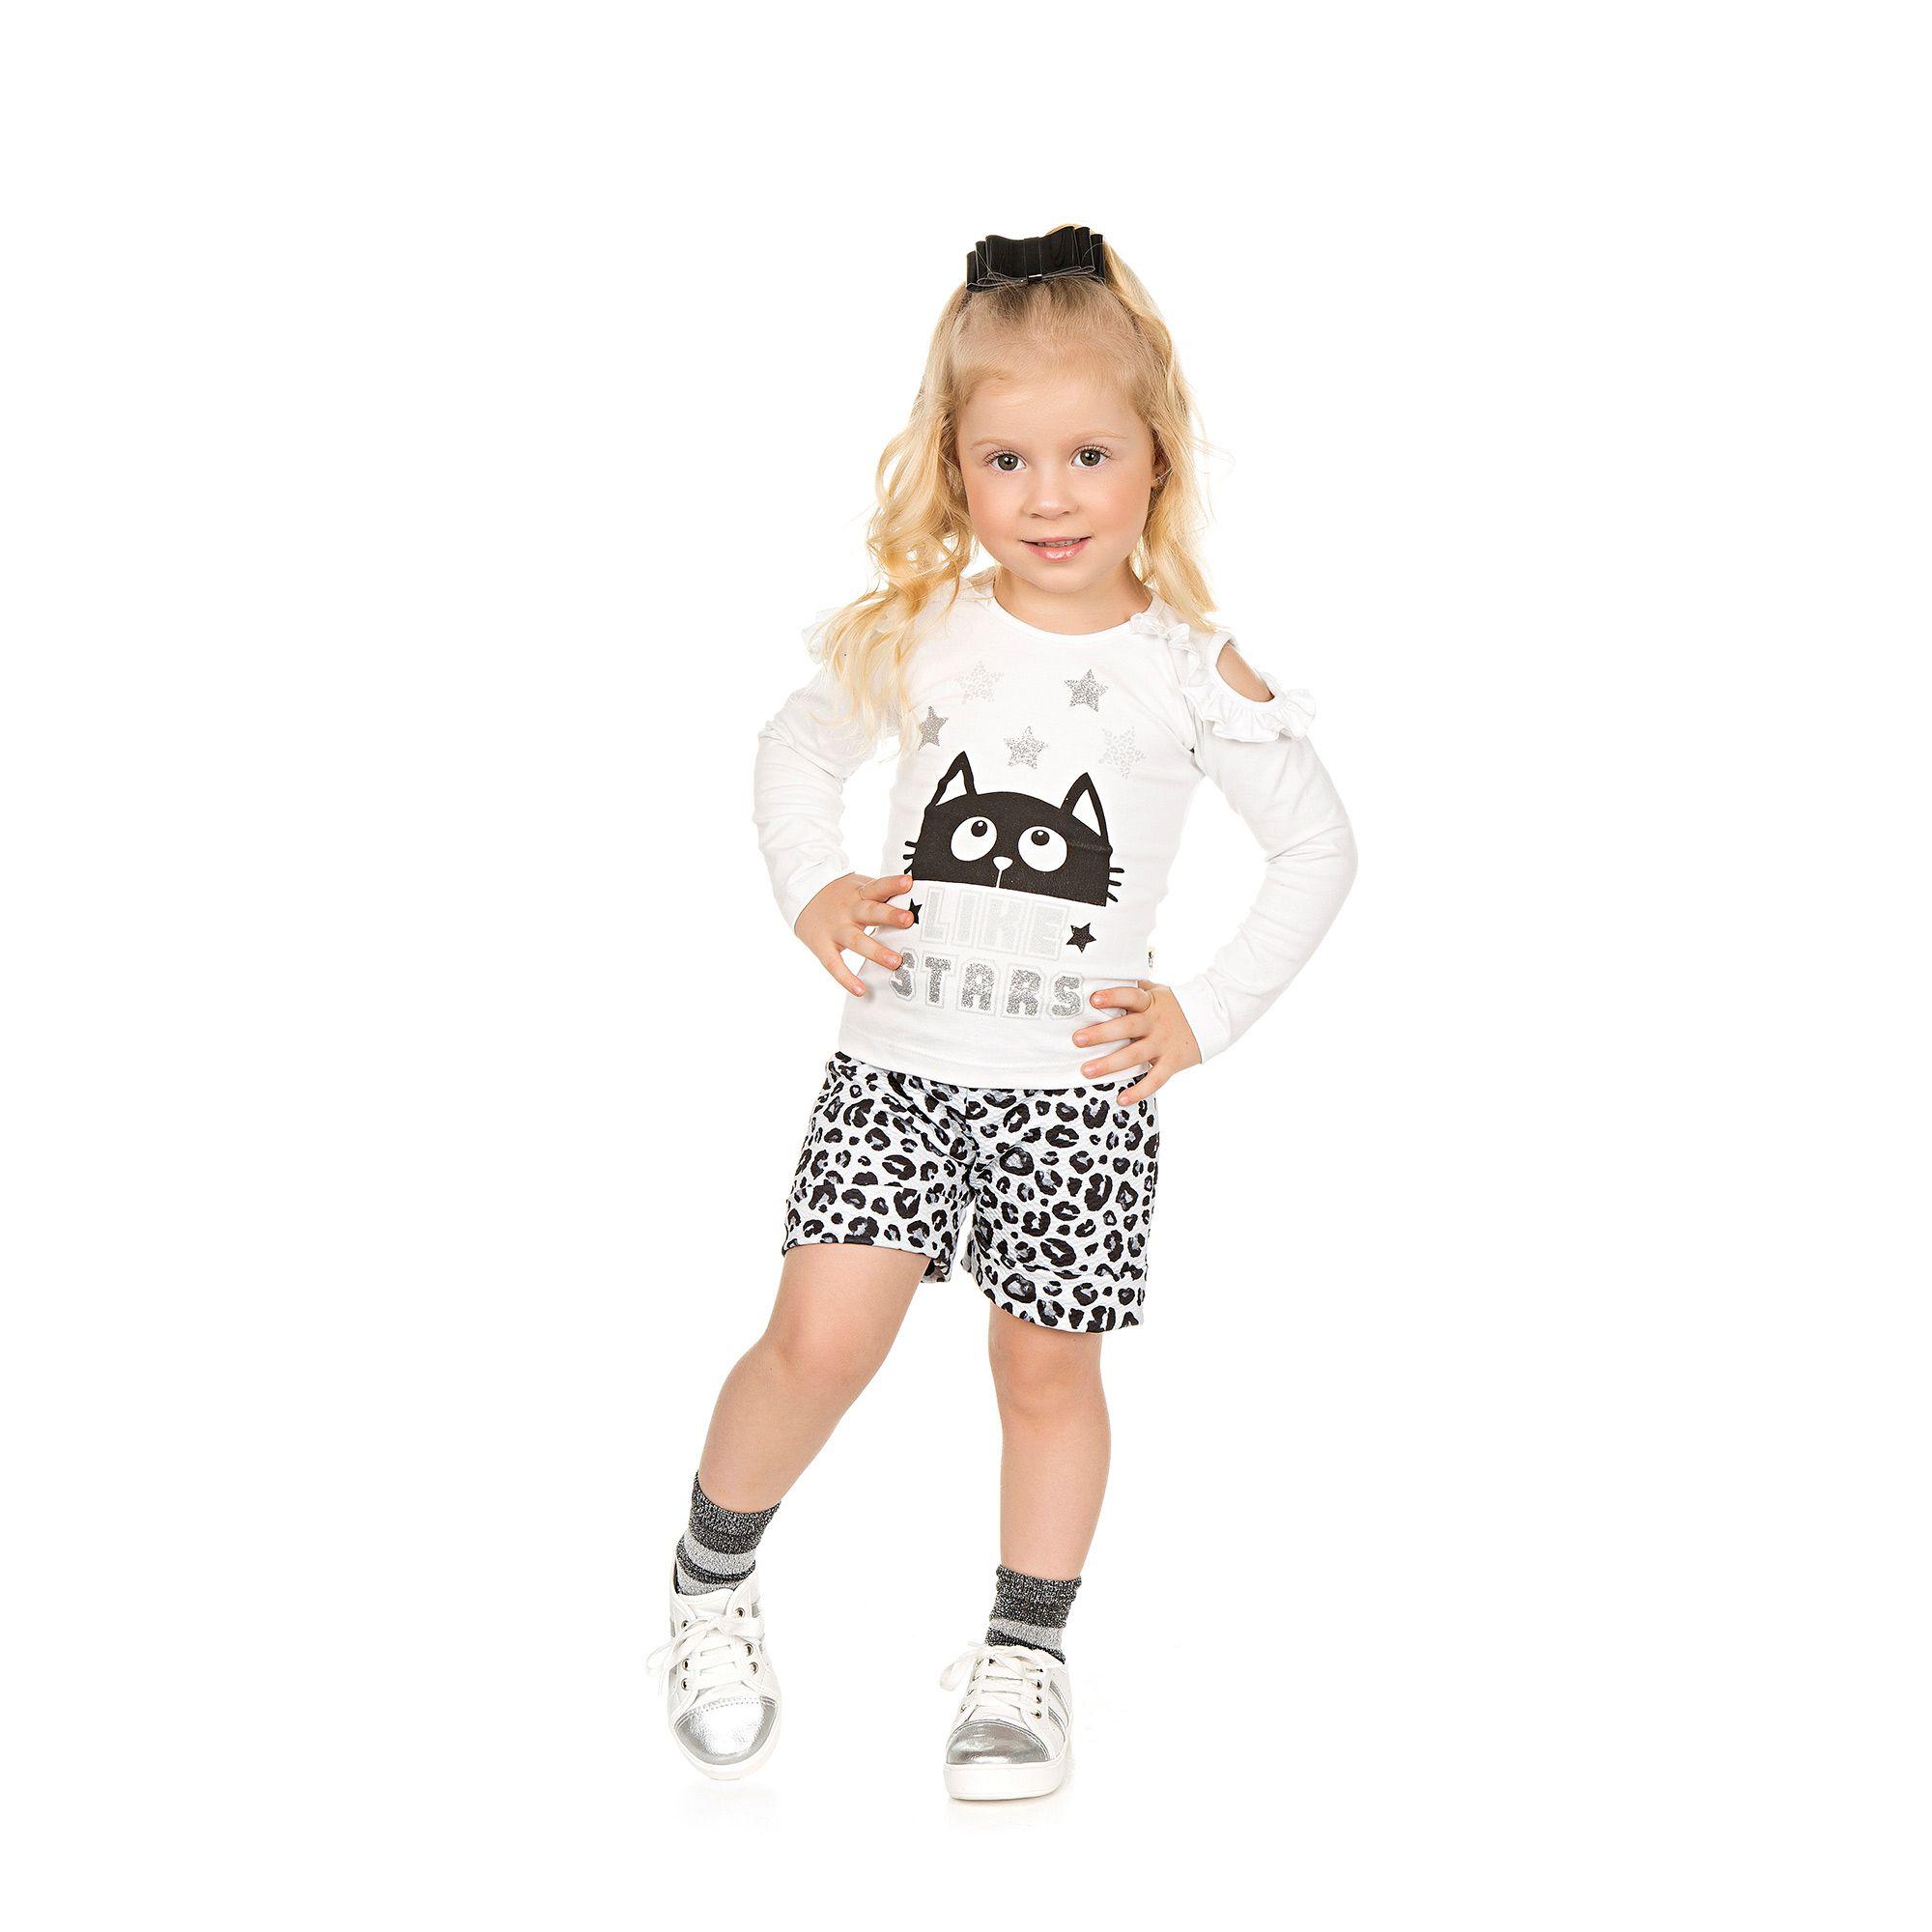 Conjunto Blusa + Shorts Infantil 2 peças - Ref 4961 - Branco/ME02